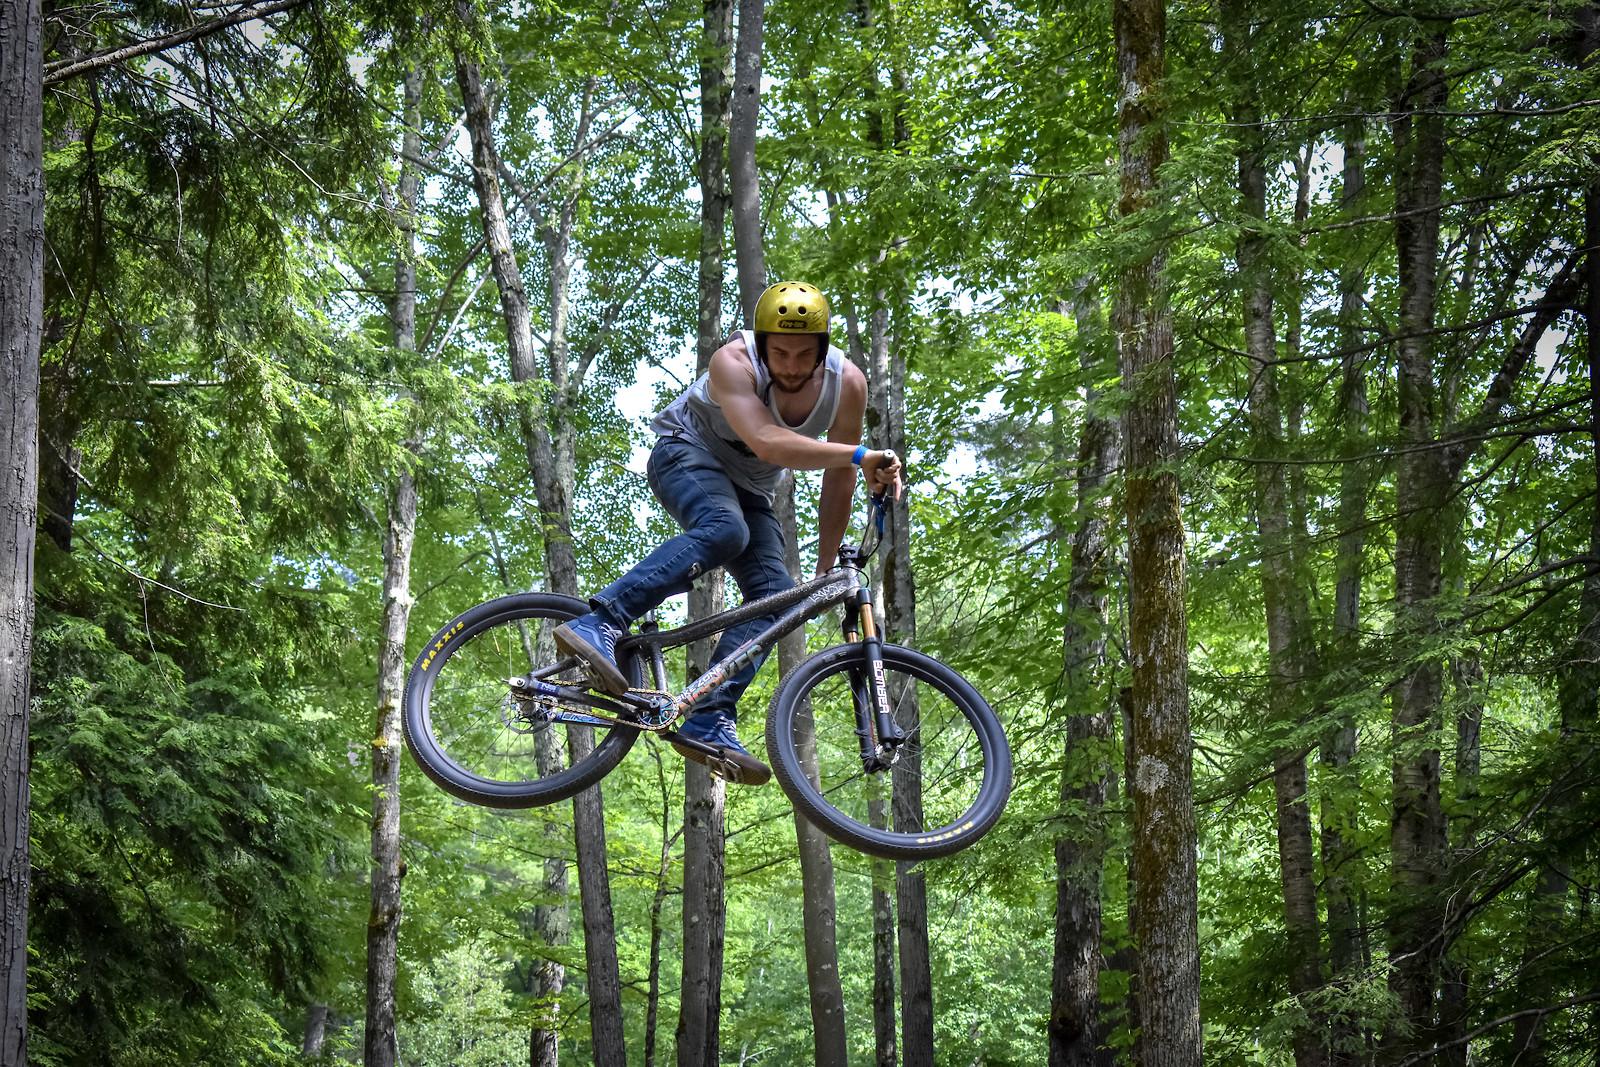 Sherwood Forest - SmashNick - Mountain Biking Pictures - Vital MTB